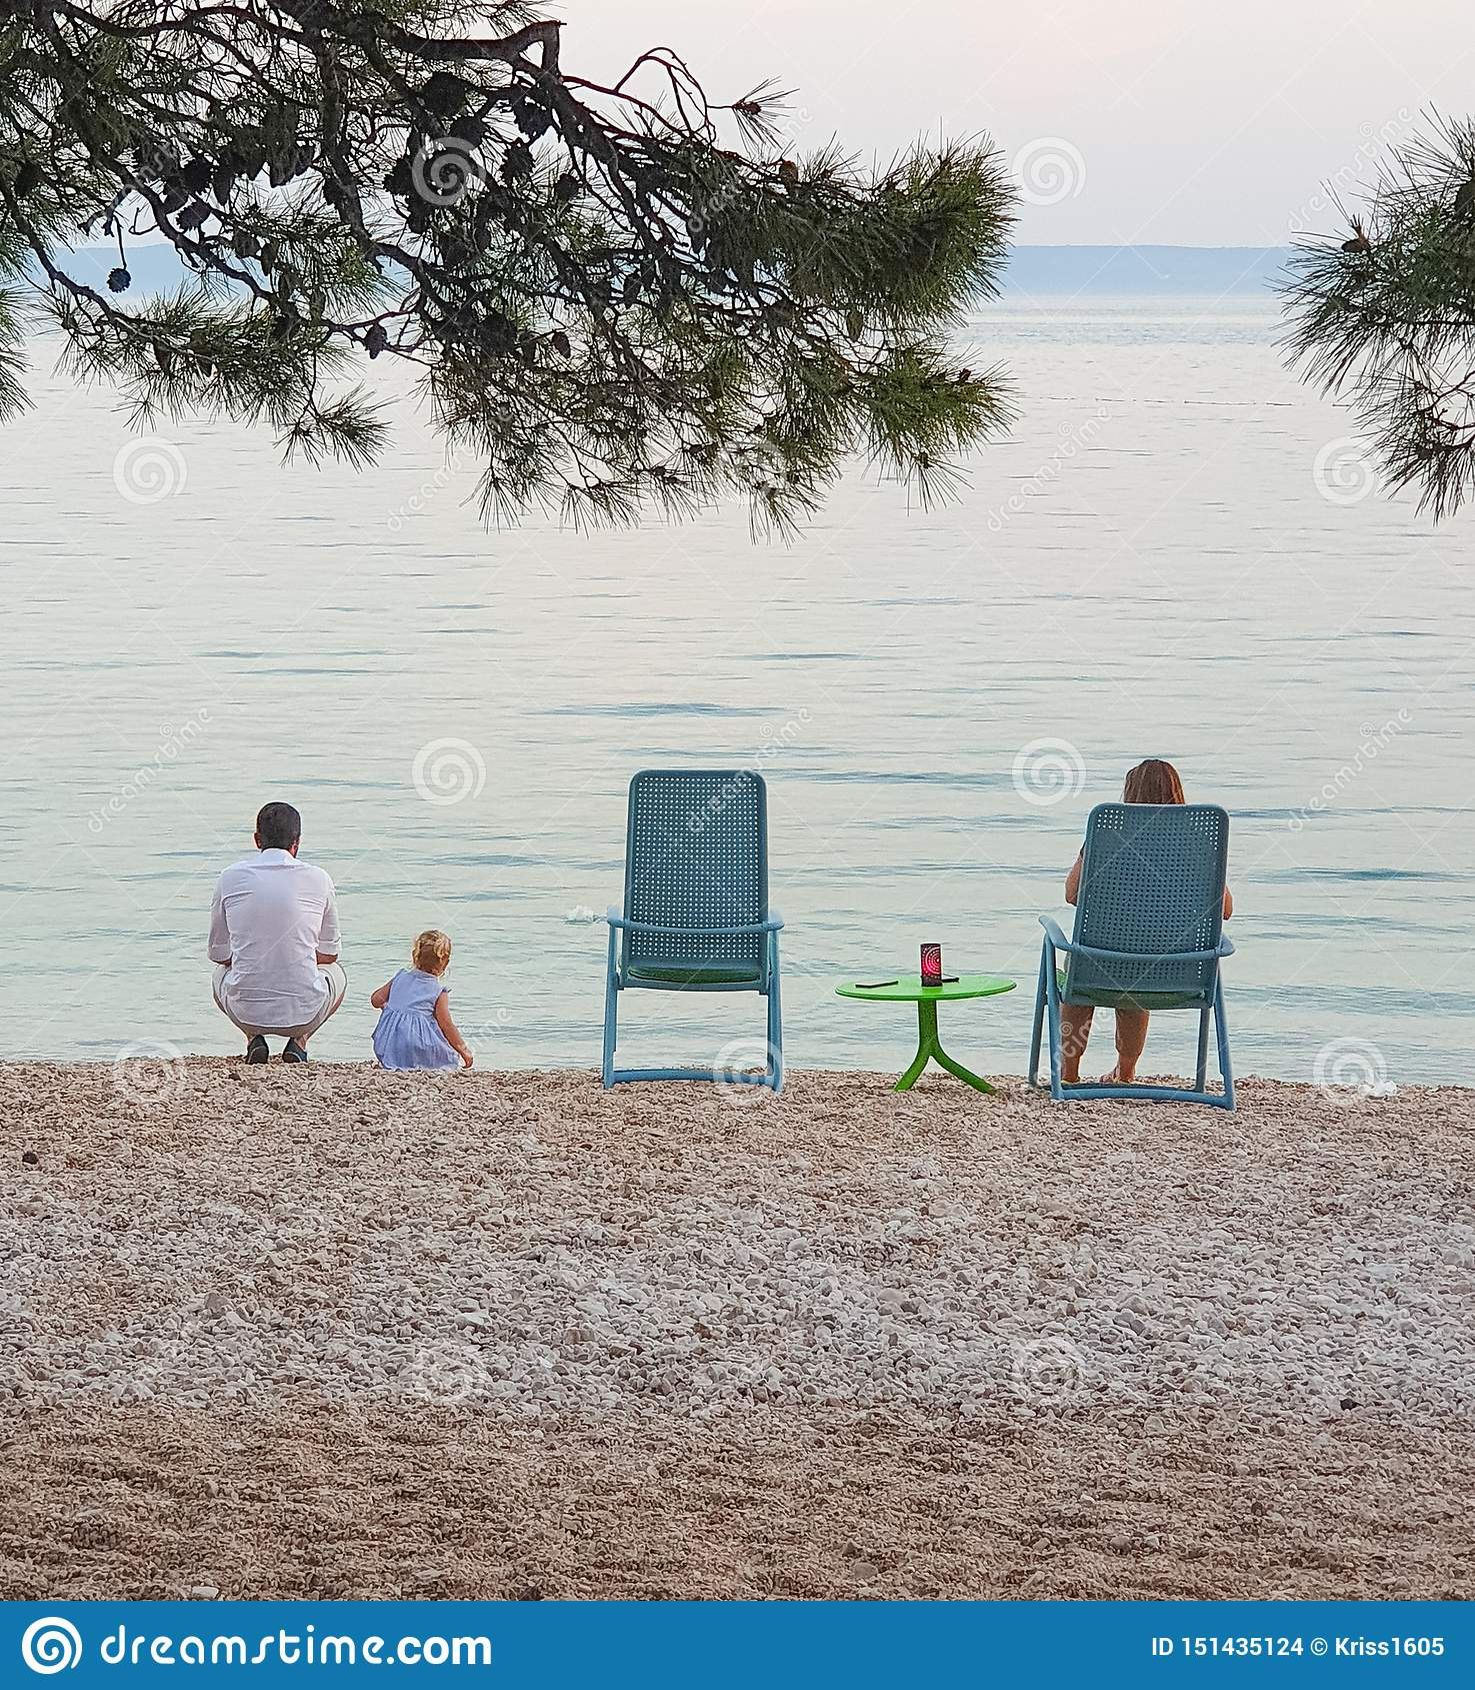 Brela 克罗地亚- 2019年6月14日:家庭在海边在一个露天咖啡馆的晚上